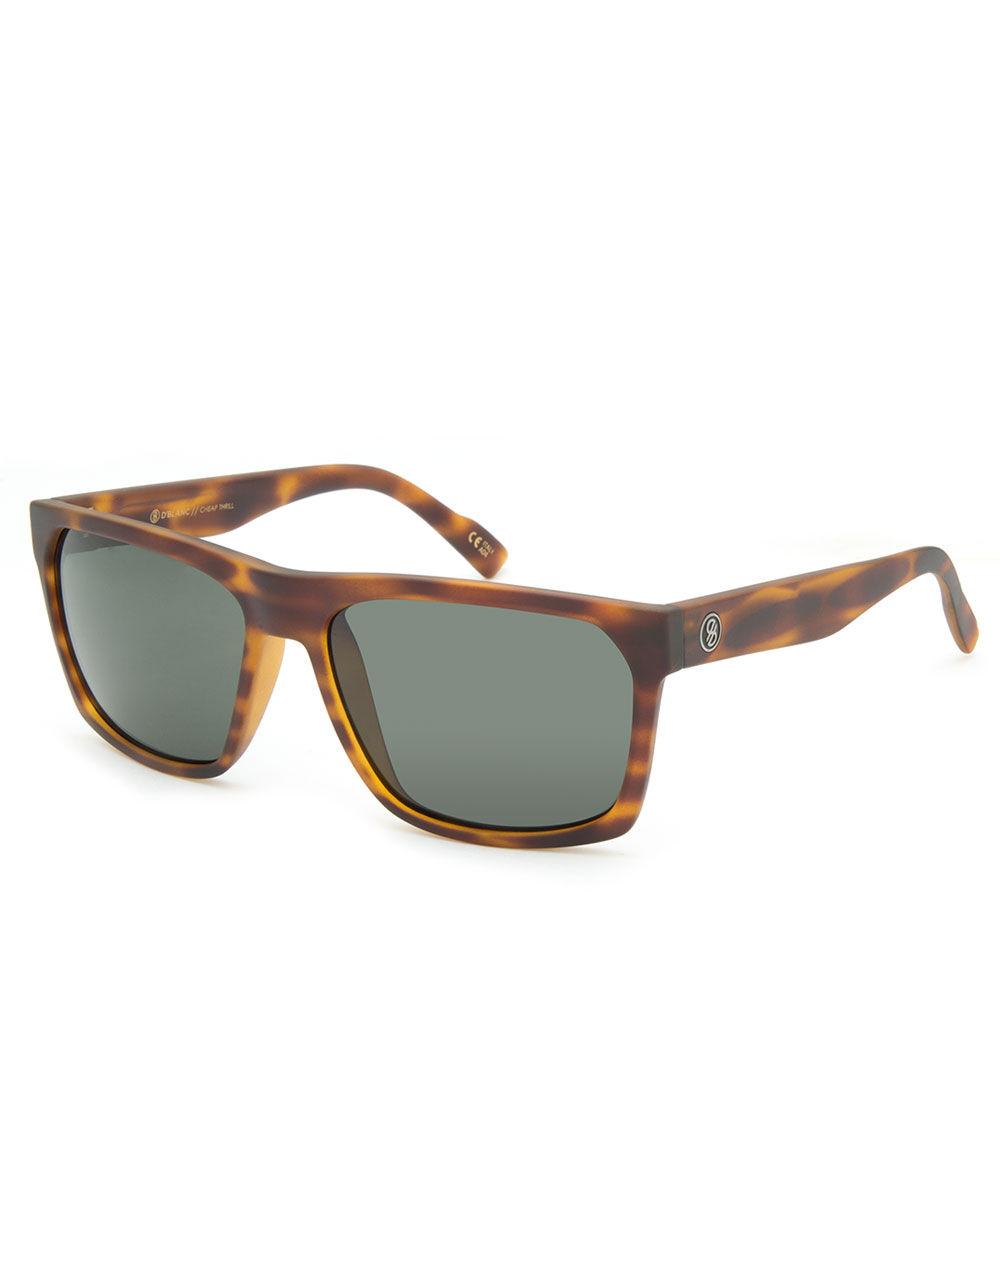 D'BLANC Cheap Thrills Sunglasses